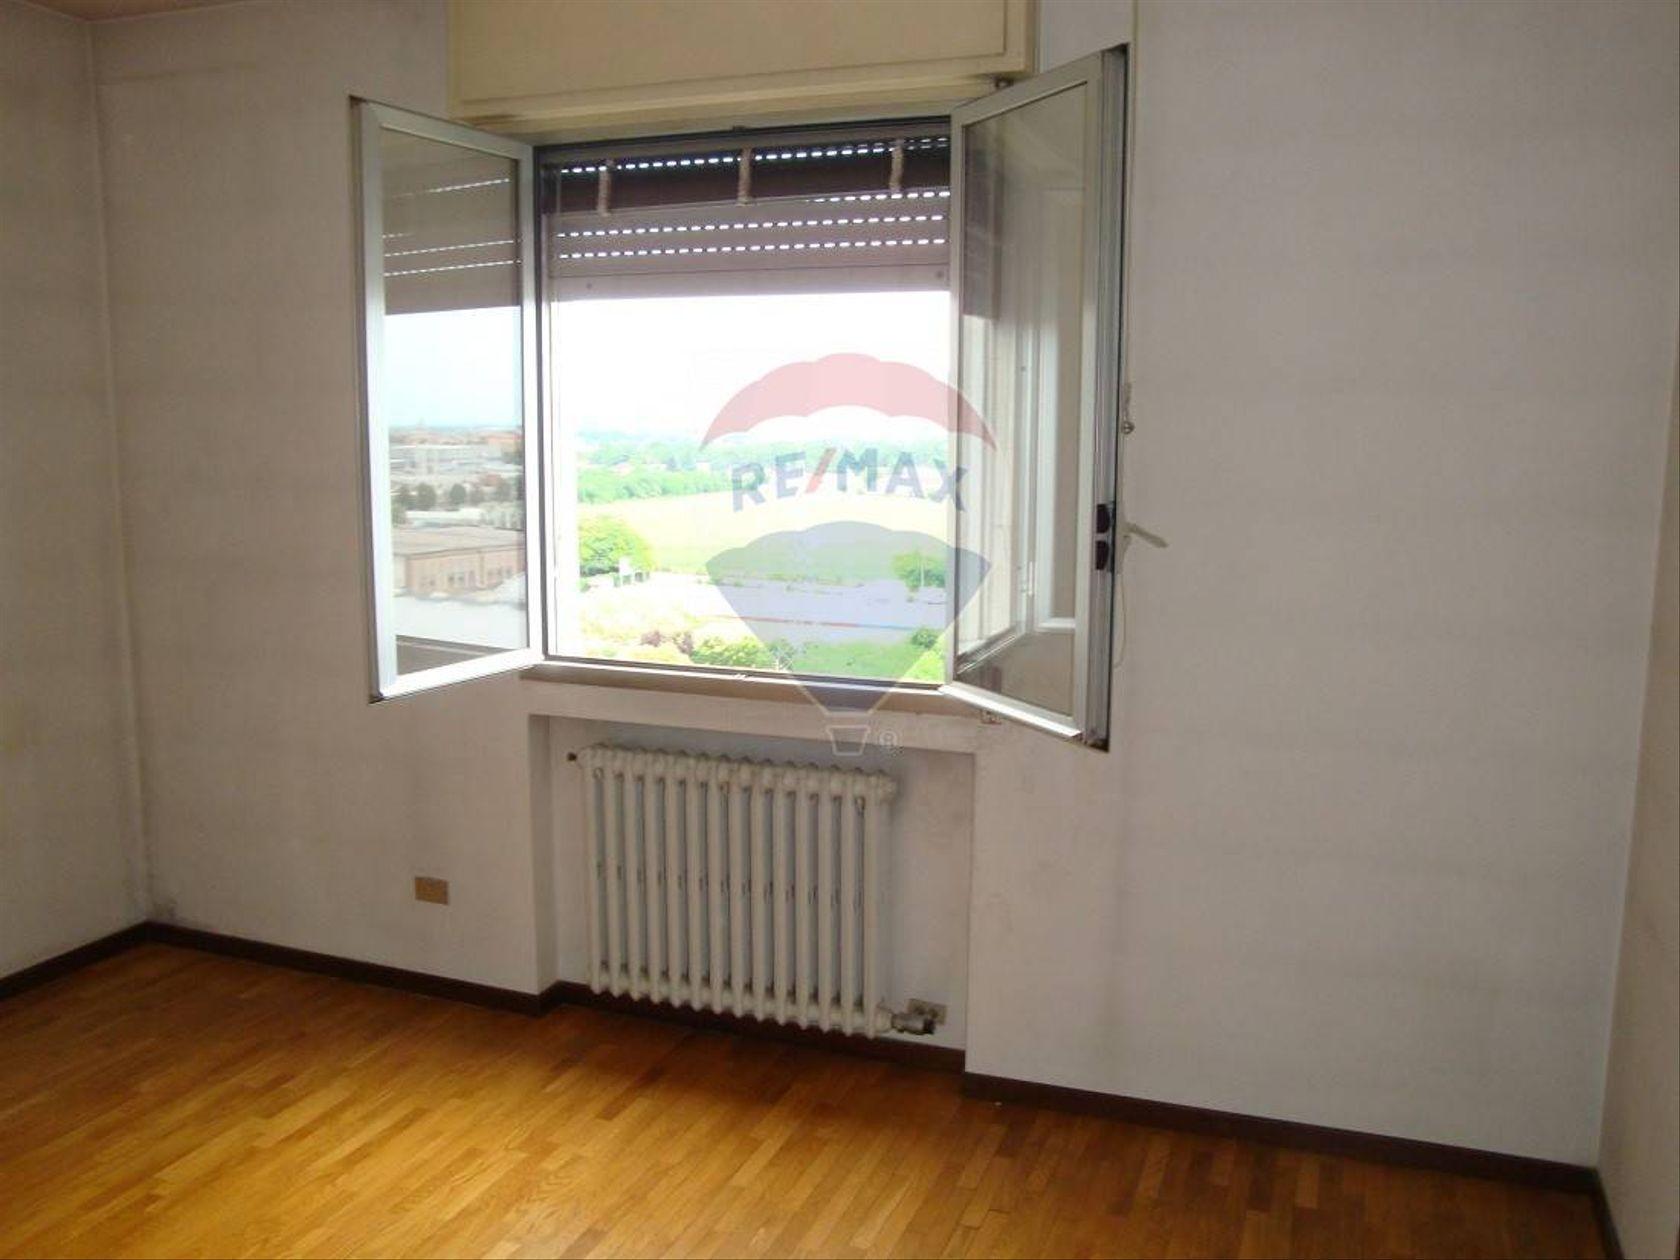 Appartamento Borgo Venezia, Verona, VR Vendita - Foto 17